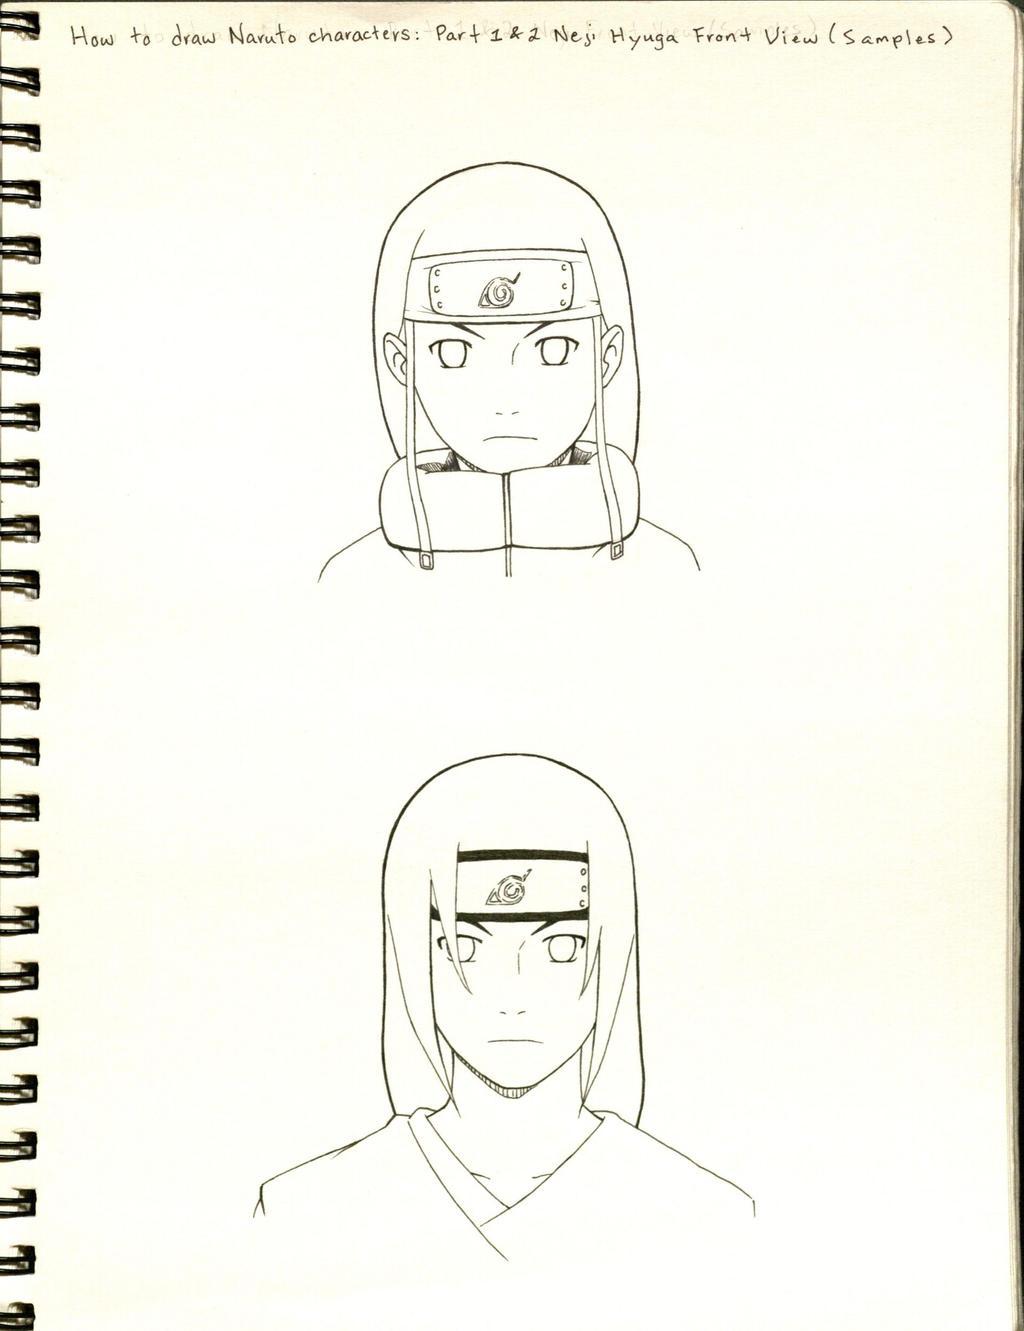 How to draw naruto characters sample 1 by byakusharingan1017 on